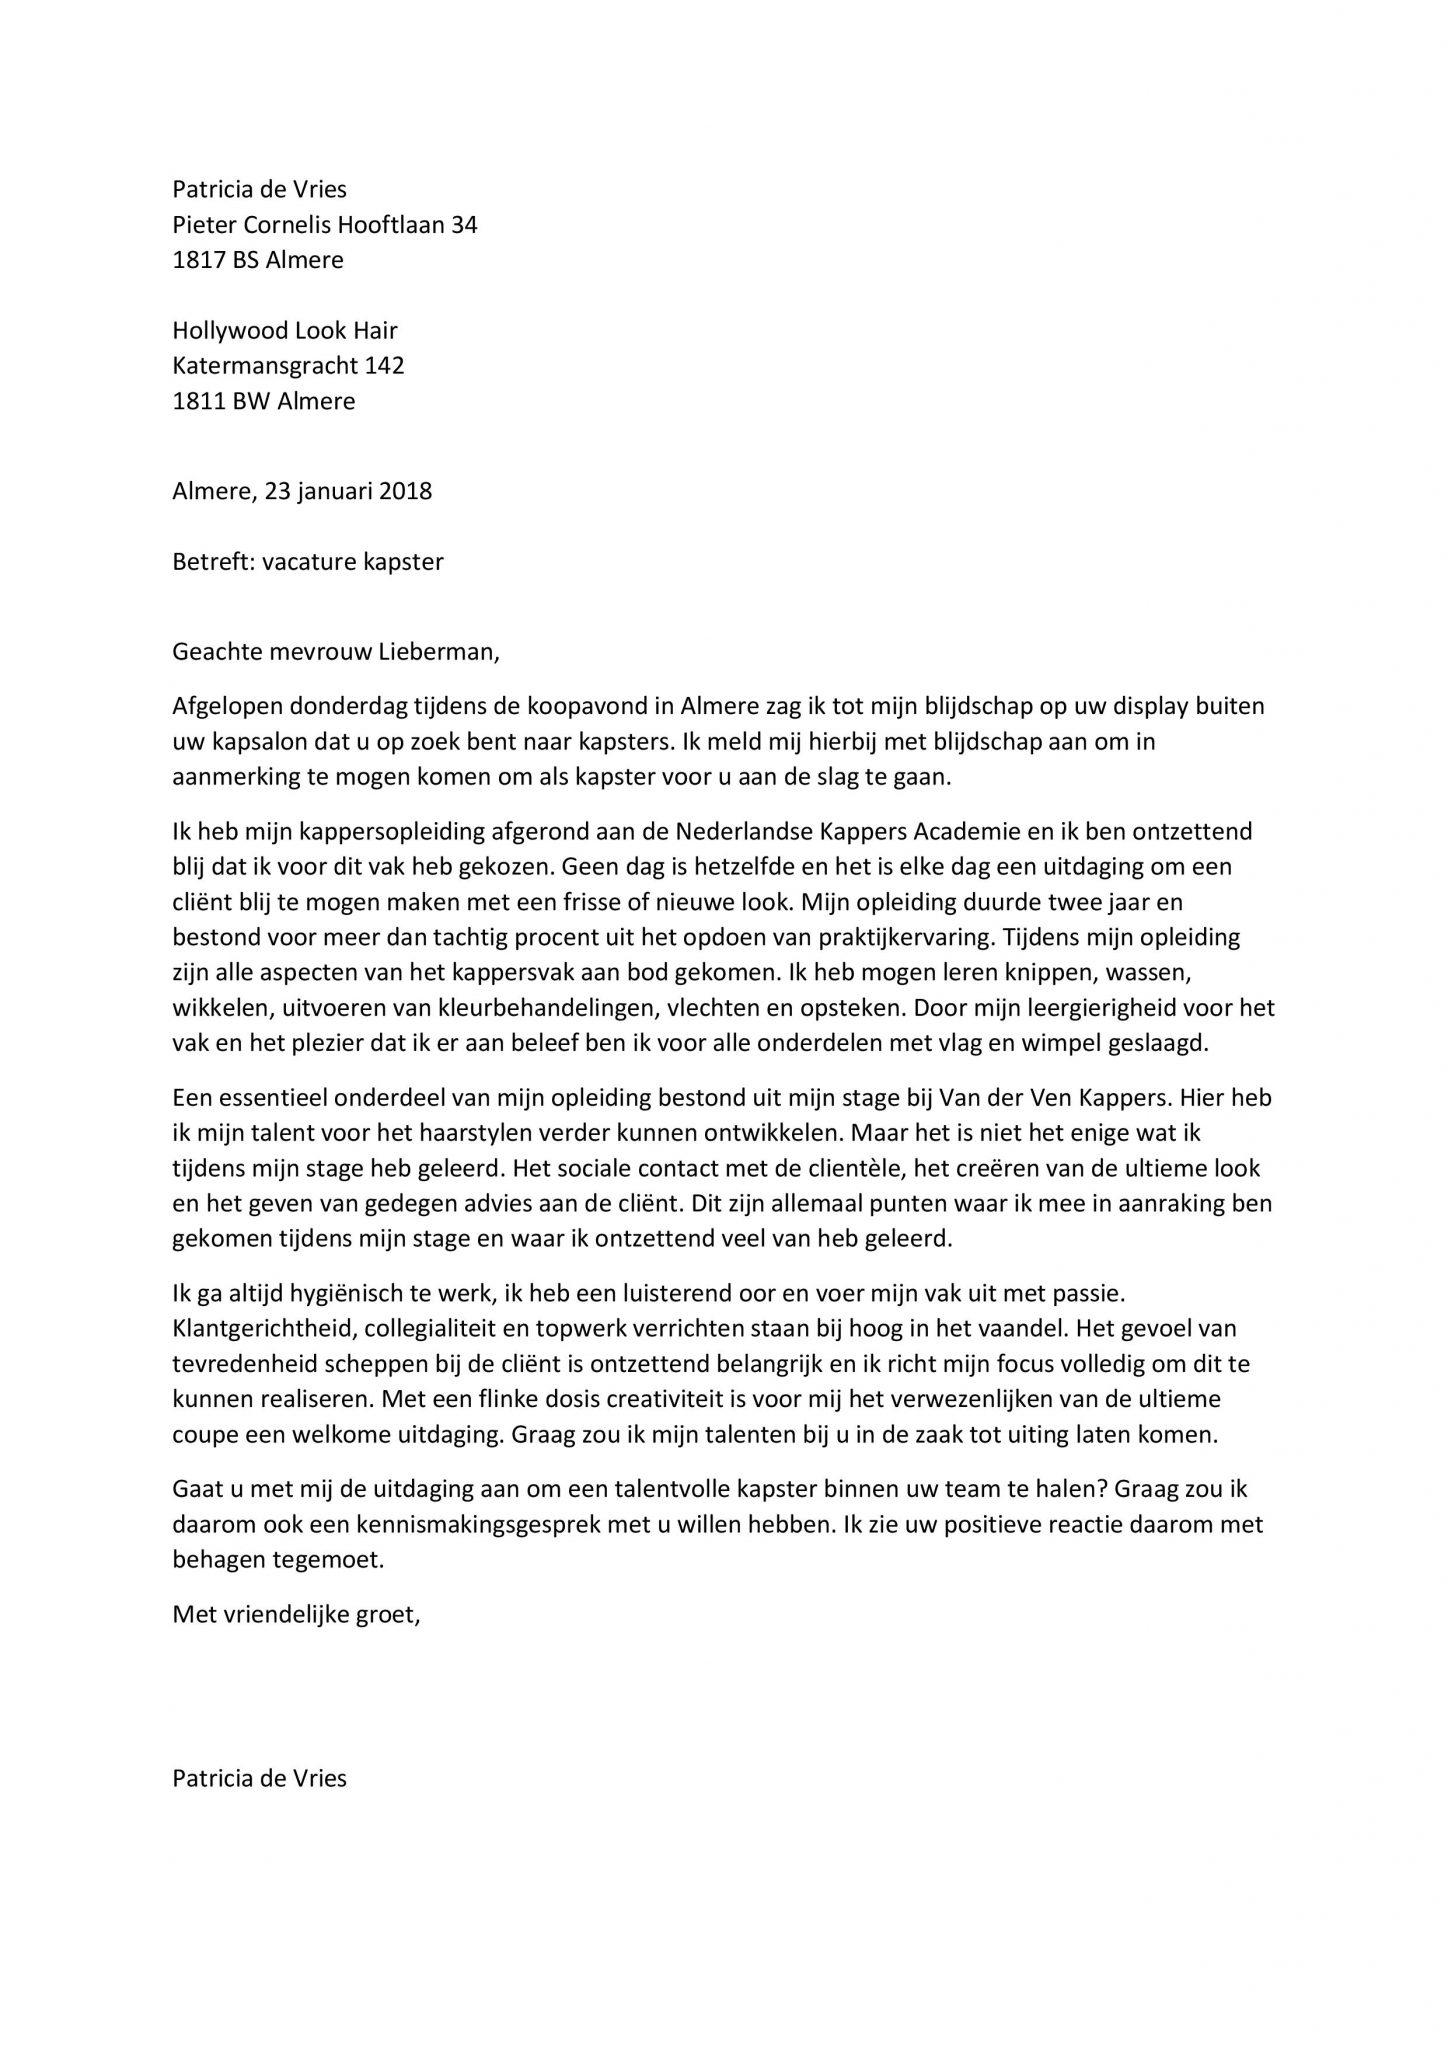 motivatiebrief ict opleiding Sollicitatiebrief Kapster | De Unieke Motivatiebrief Voor De  motivatiebrief ict opleiding